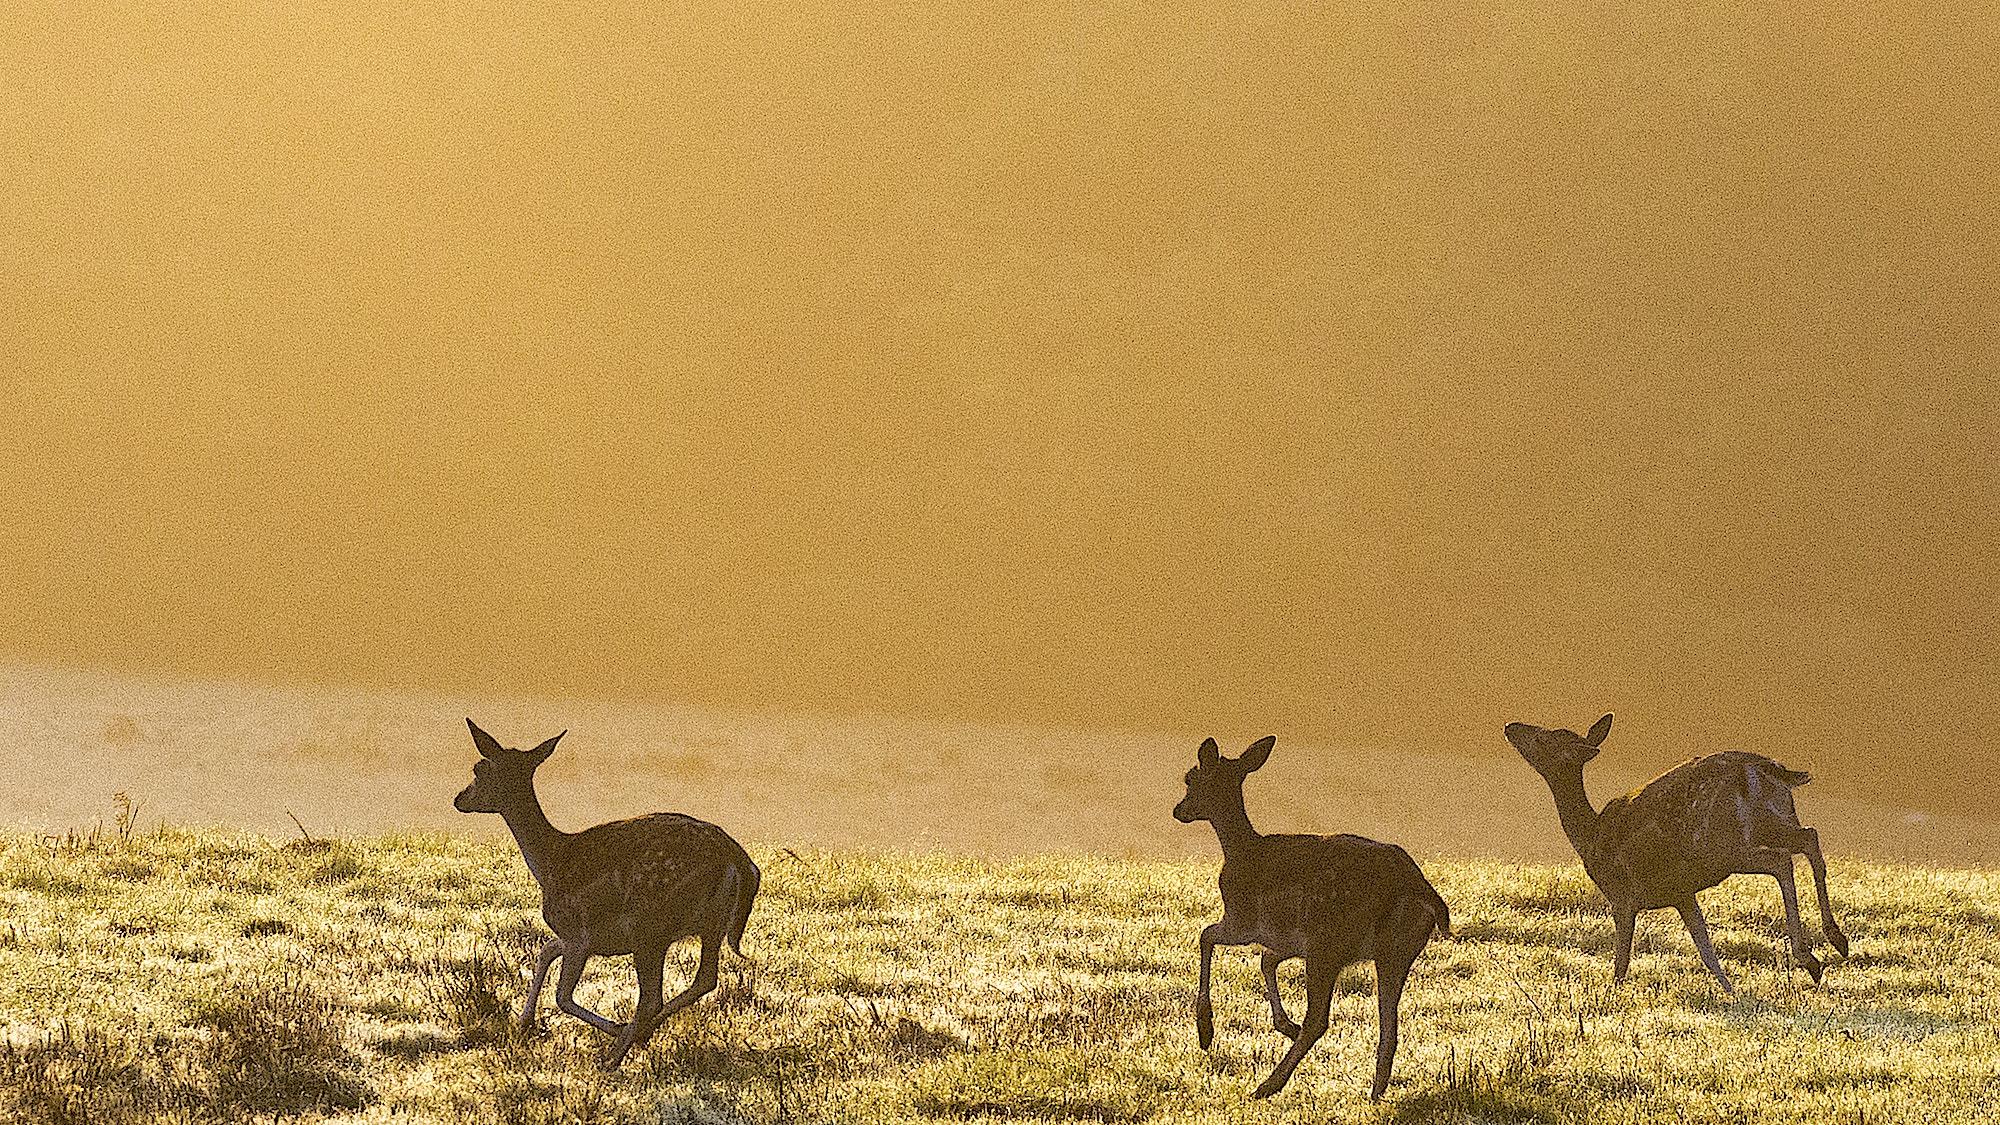 00019710 Fallow deer by James Warwick Wild Screen